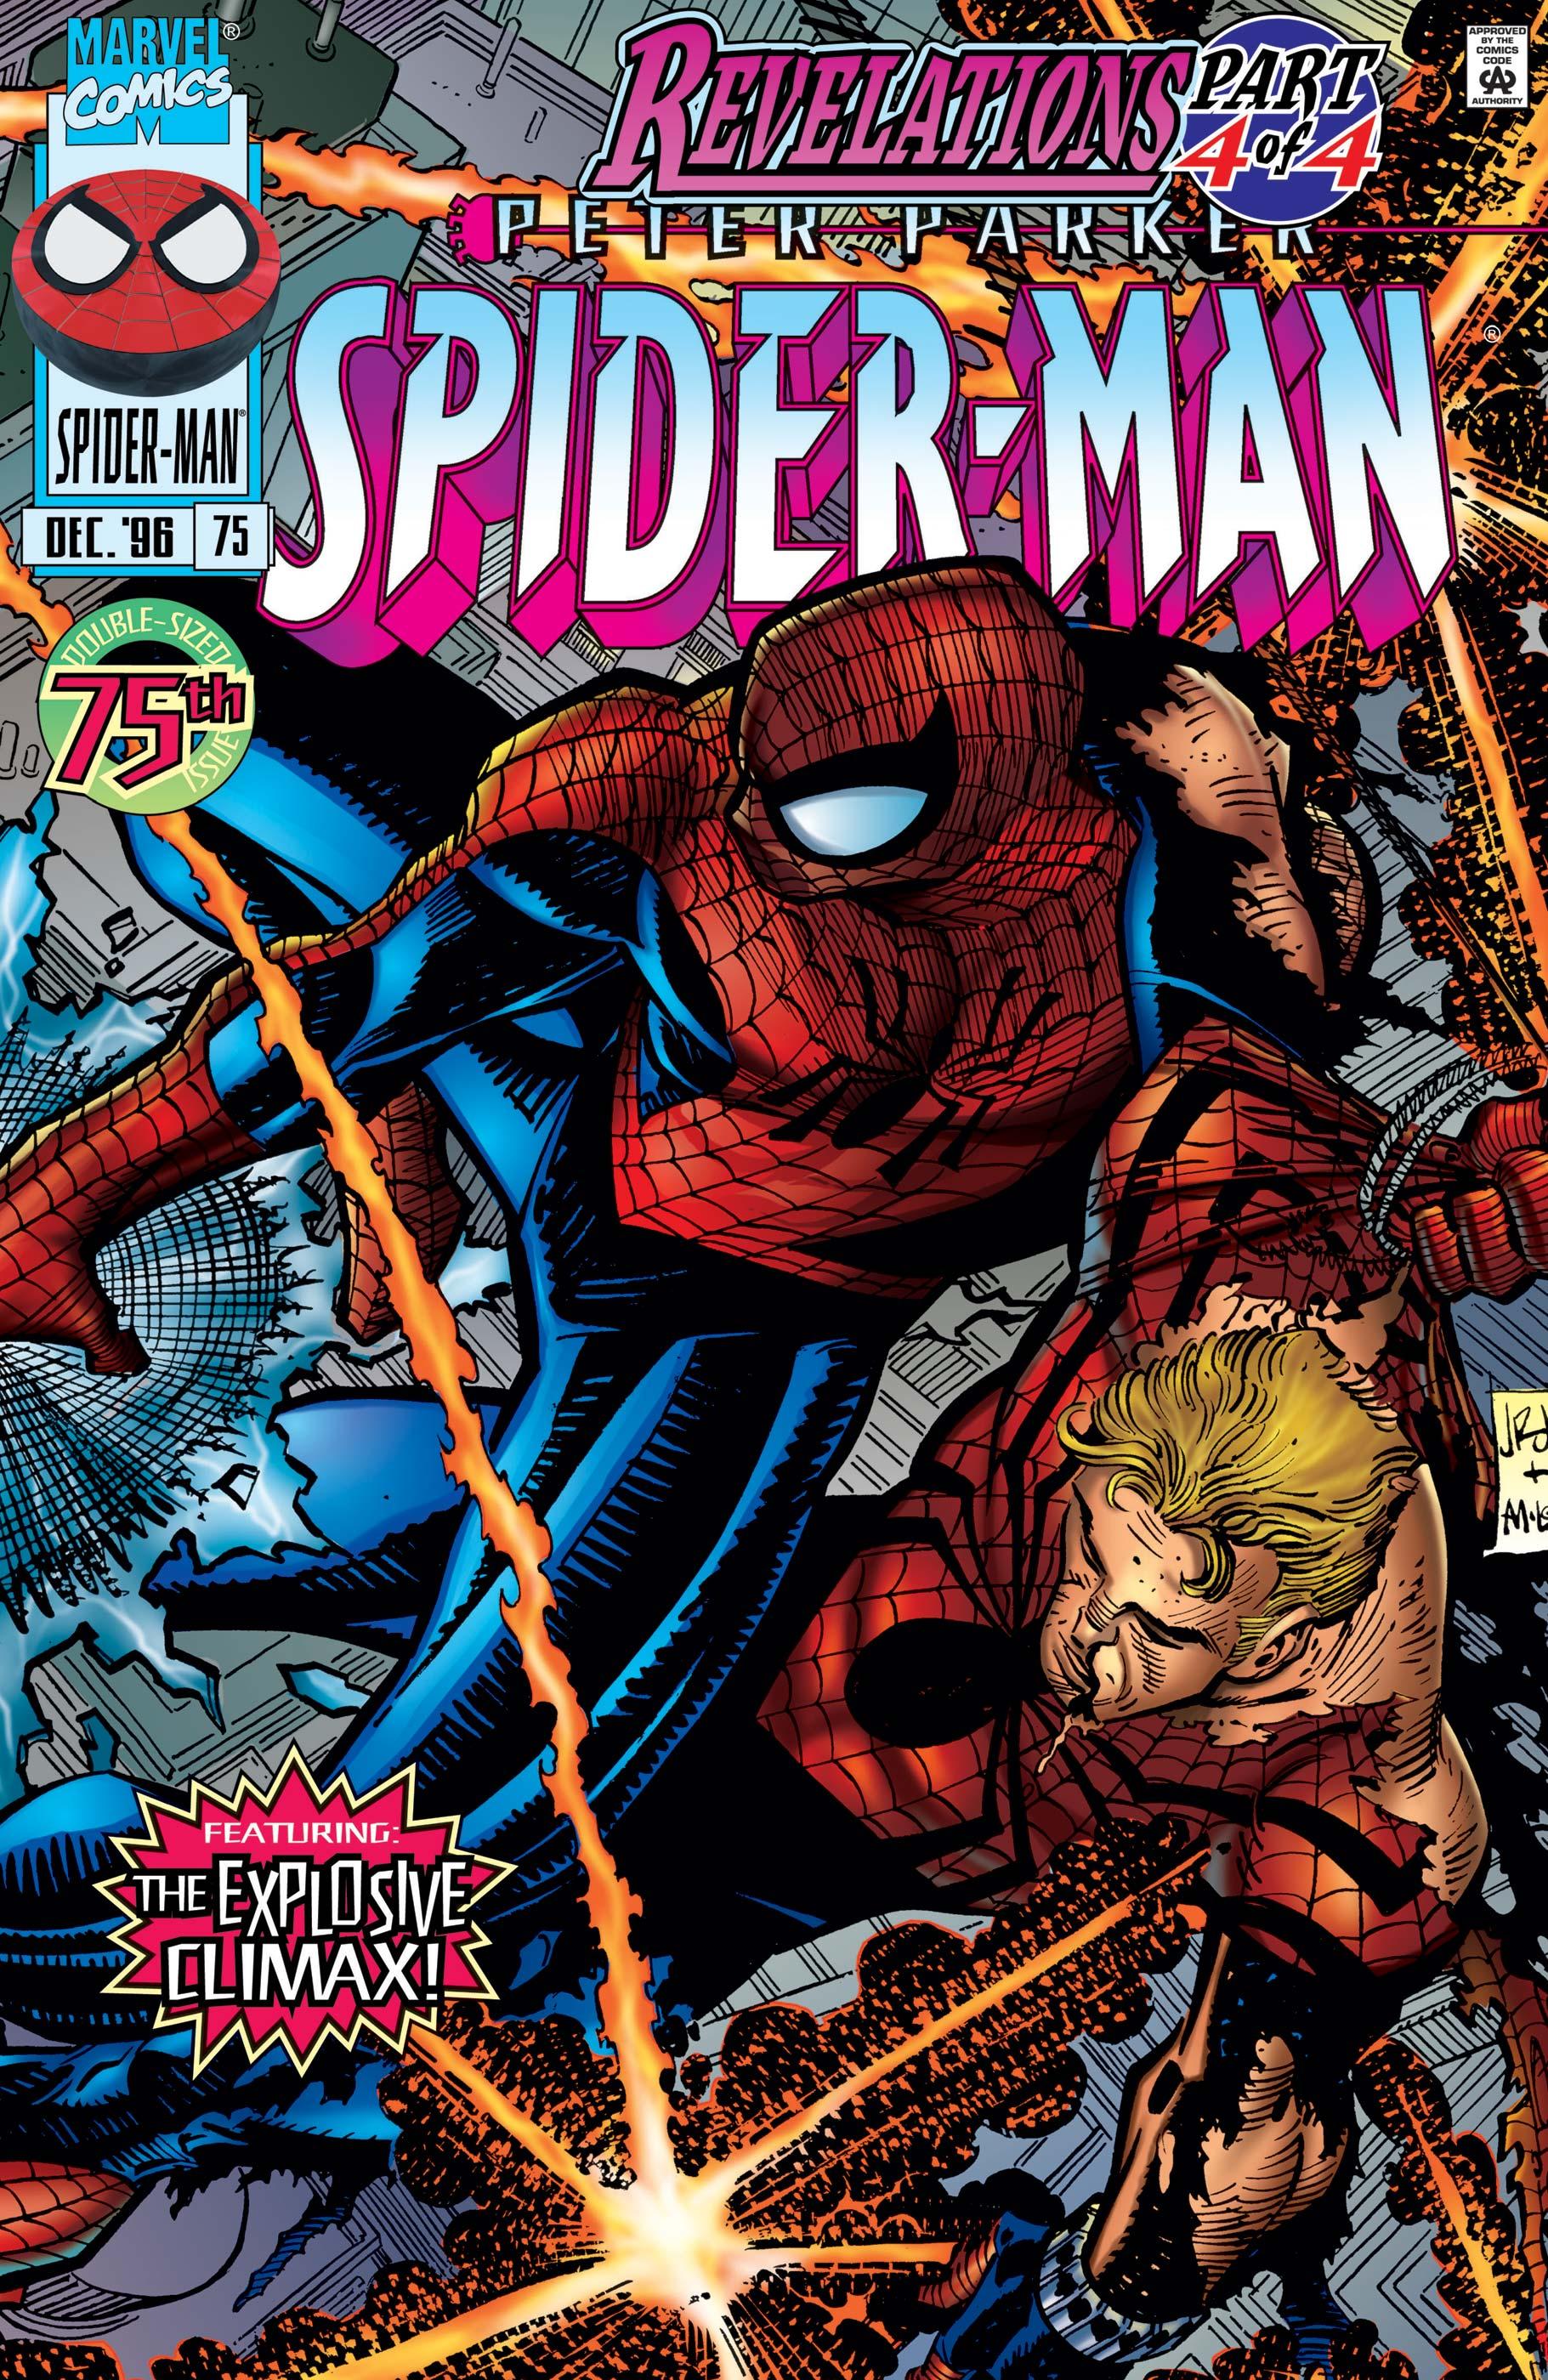 Spider-Man #73 October 1996 Marvel Comics